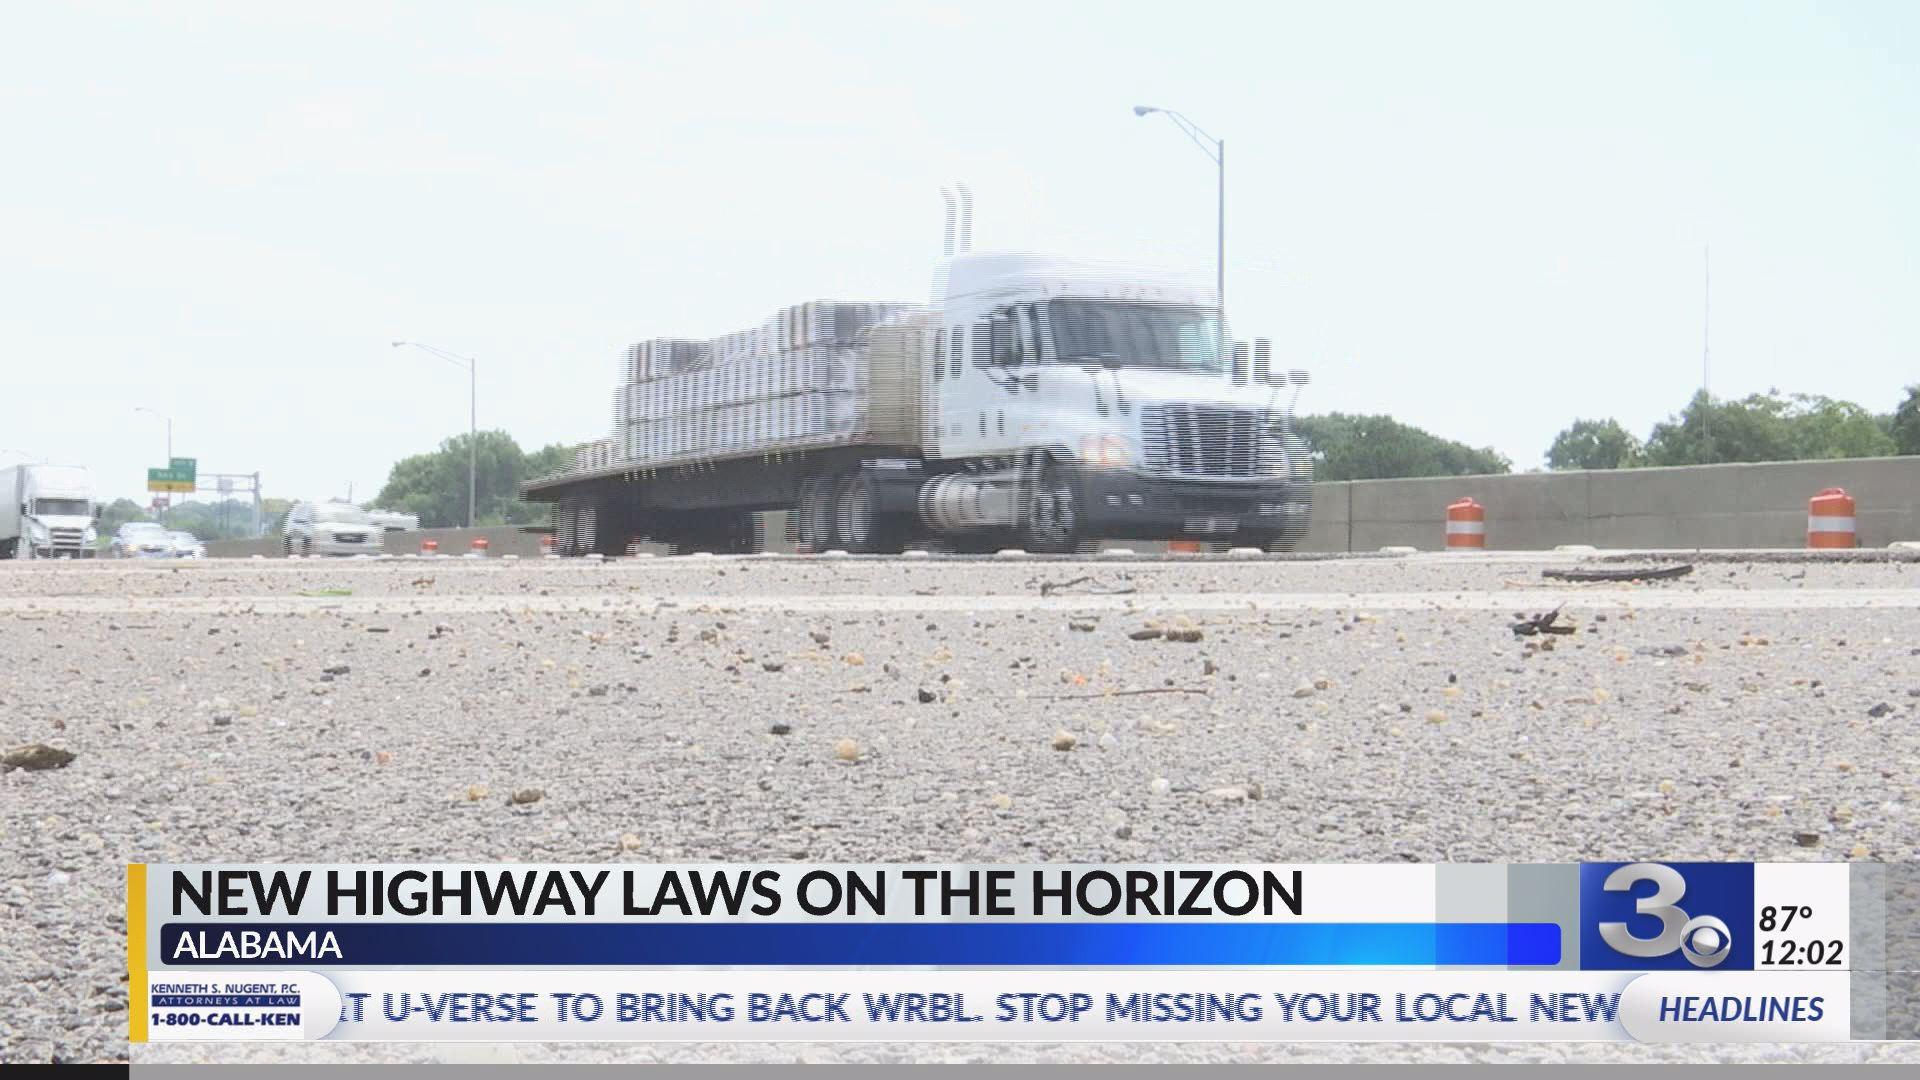 New highway laws Alabama | WRBL